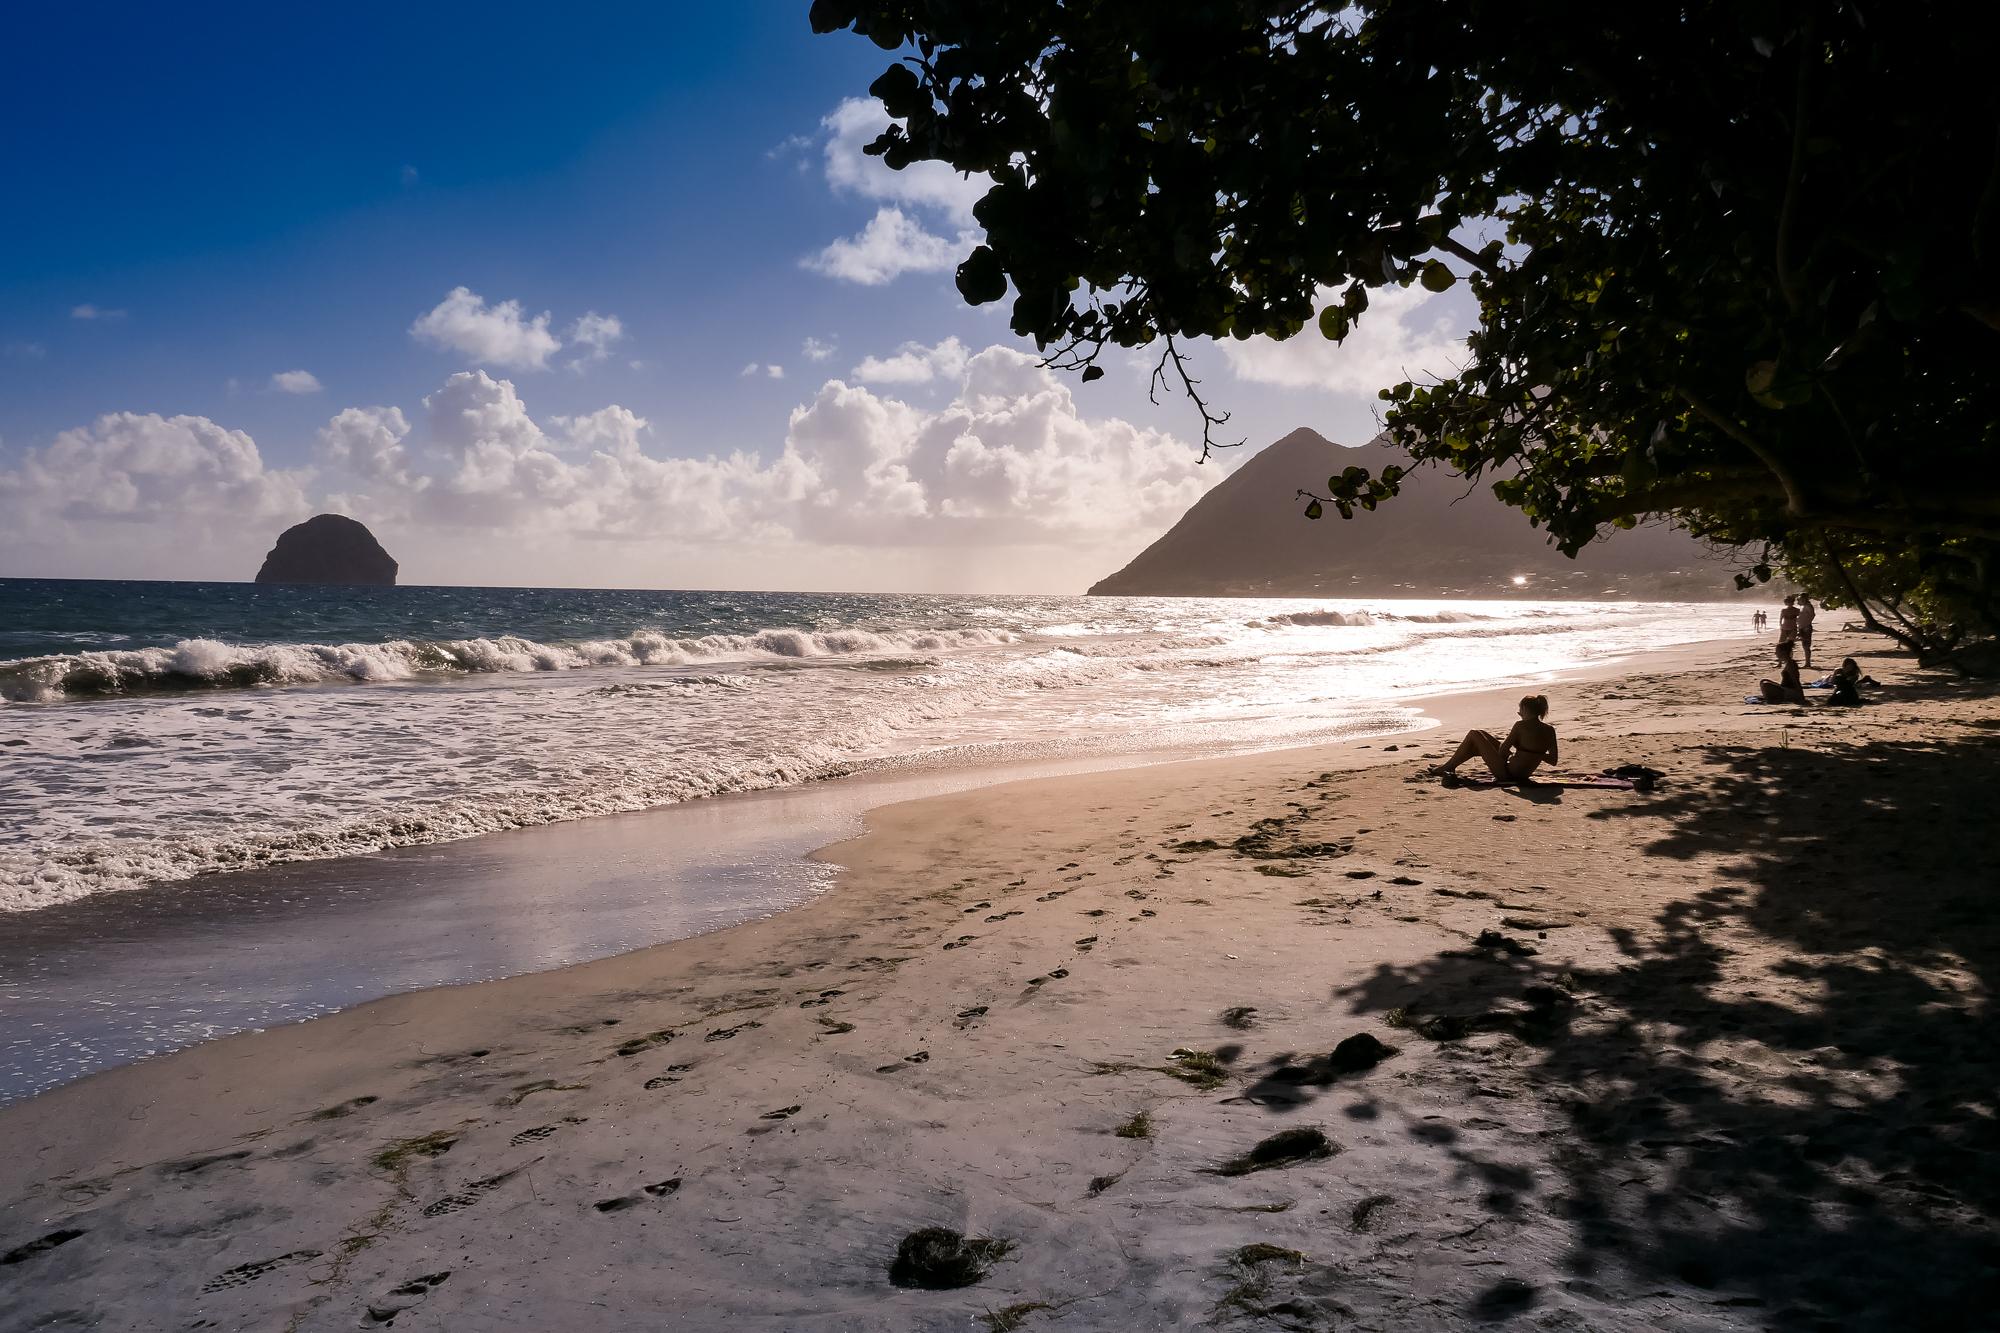 Plage du diamant, Martinique, blog voyage